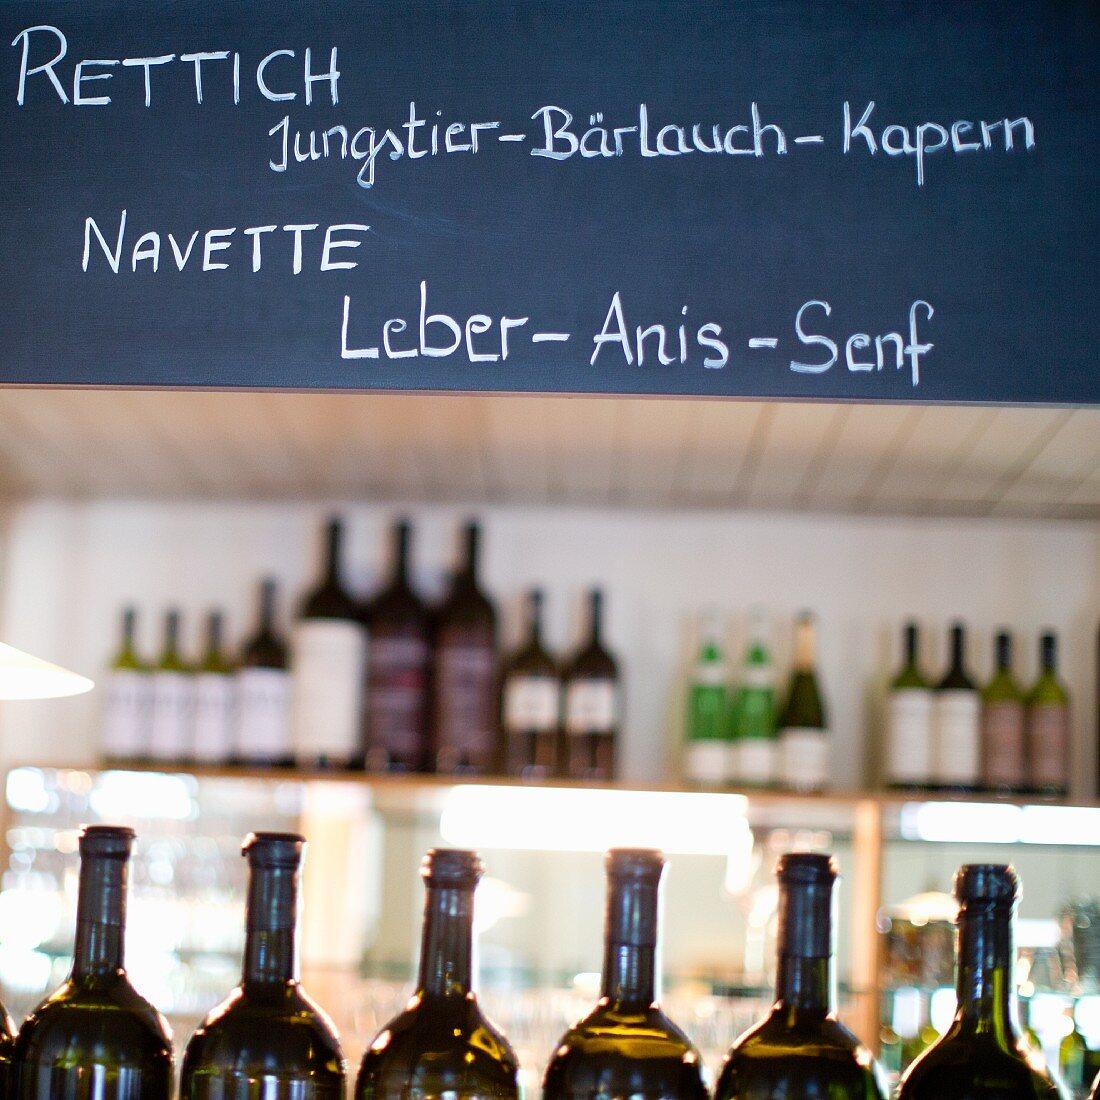 A specials board in the restaurant Saziani Stub'n, Styria, Austria